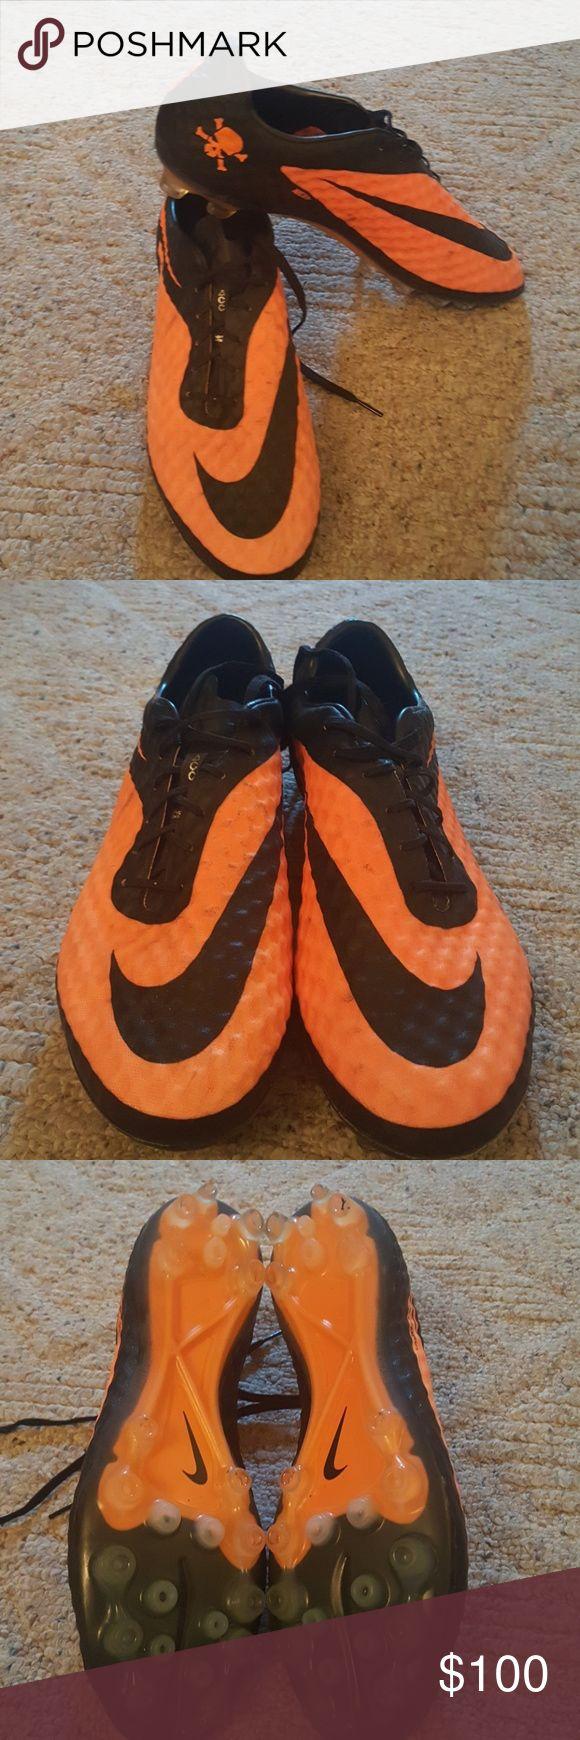 hyper venom1 turf cleats barerly worn orginal hyper venom turf  cleats nike Shoes Athletic Shoes